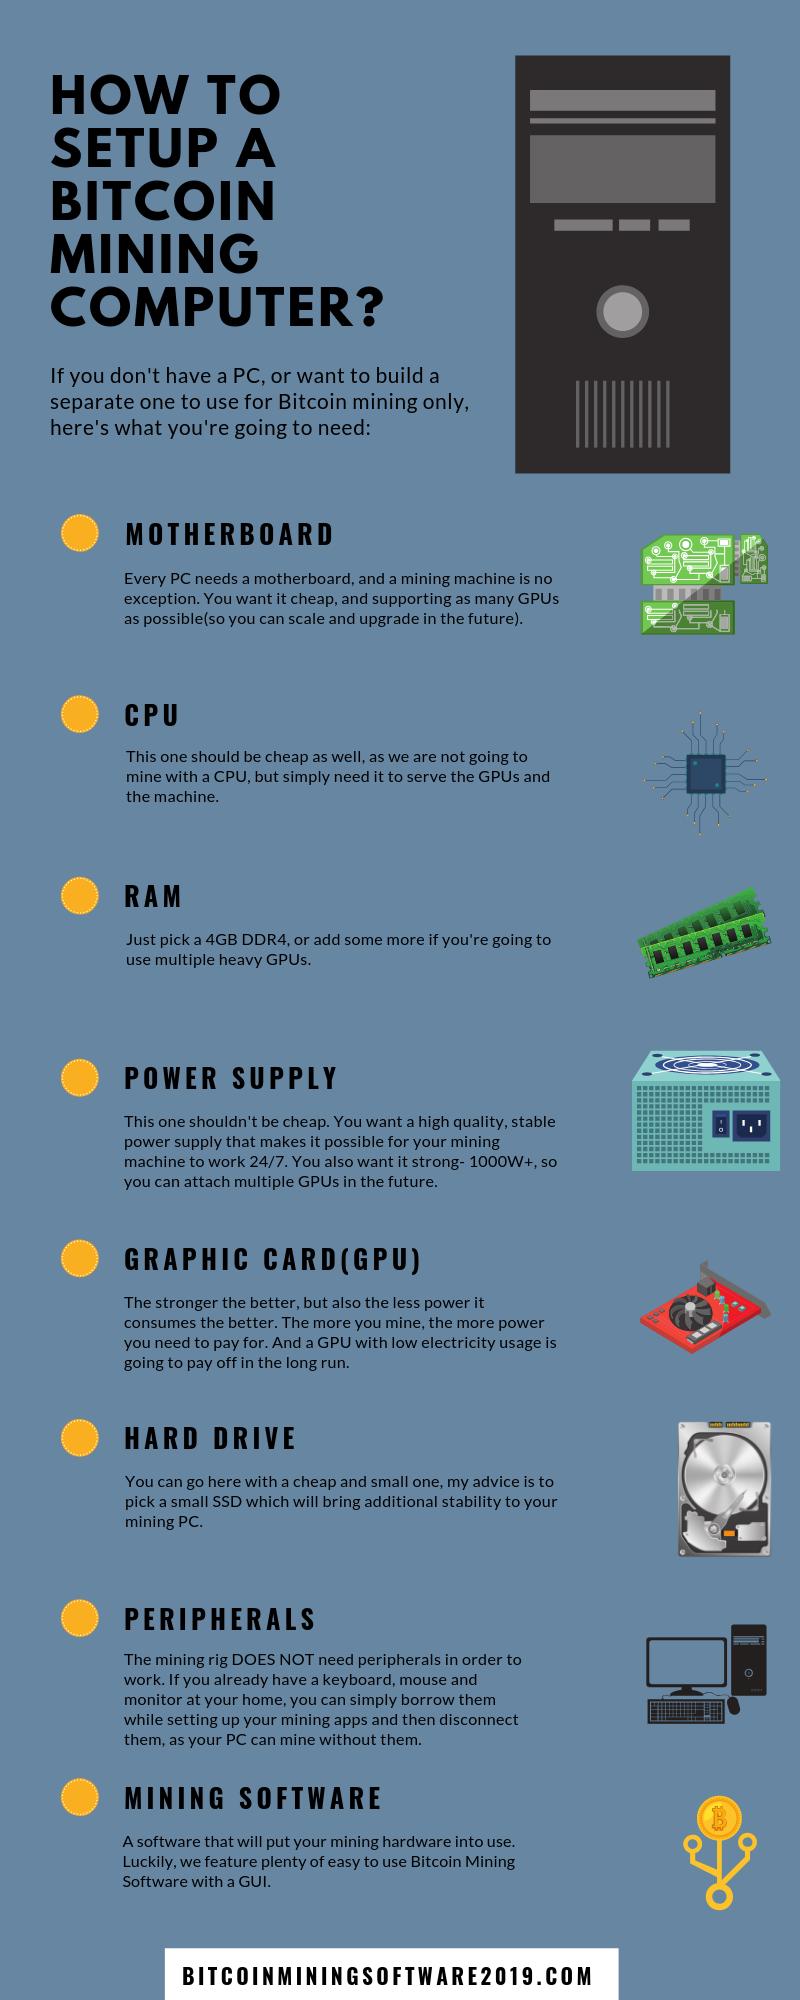 HOW TO SETUP A BITCOIN MINING COMPUTER